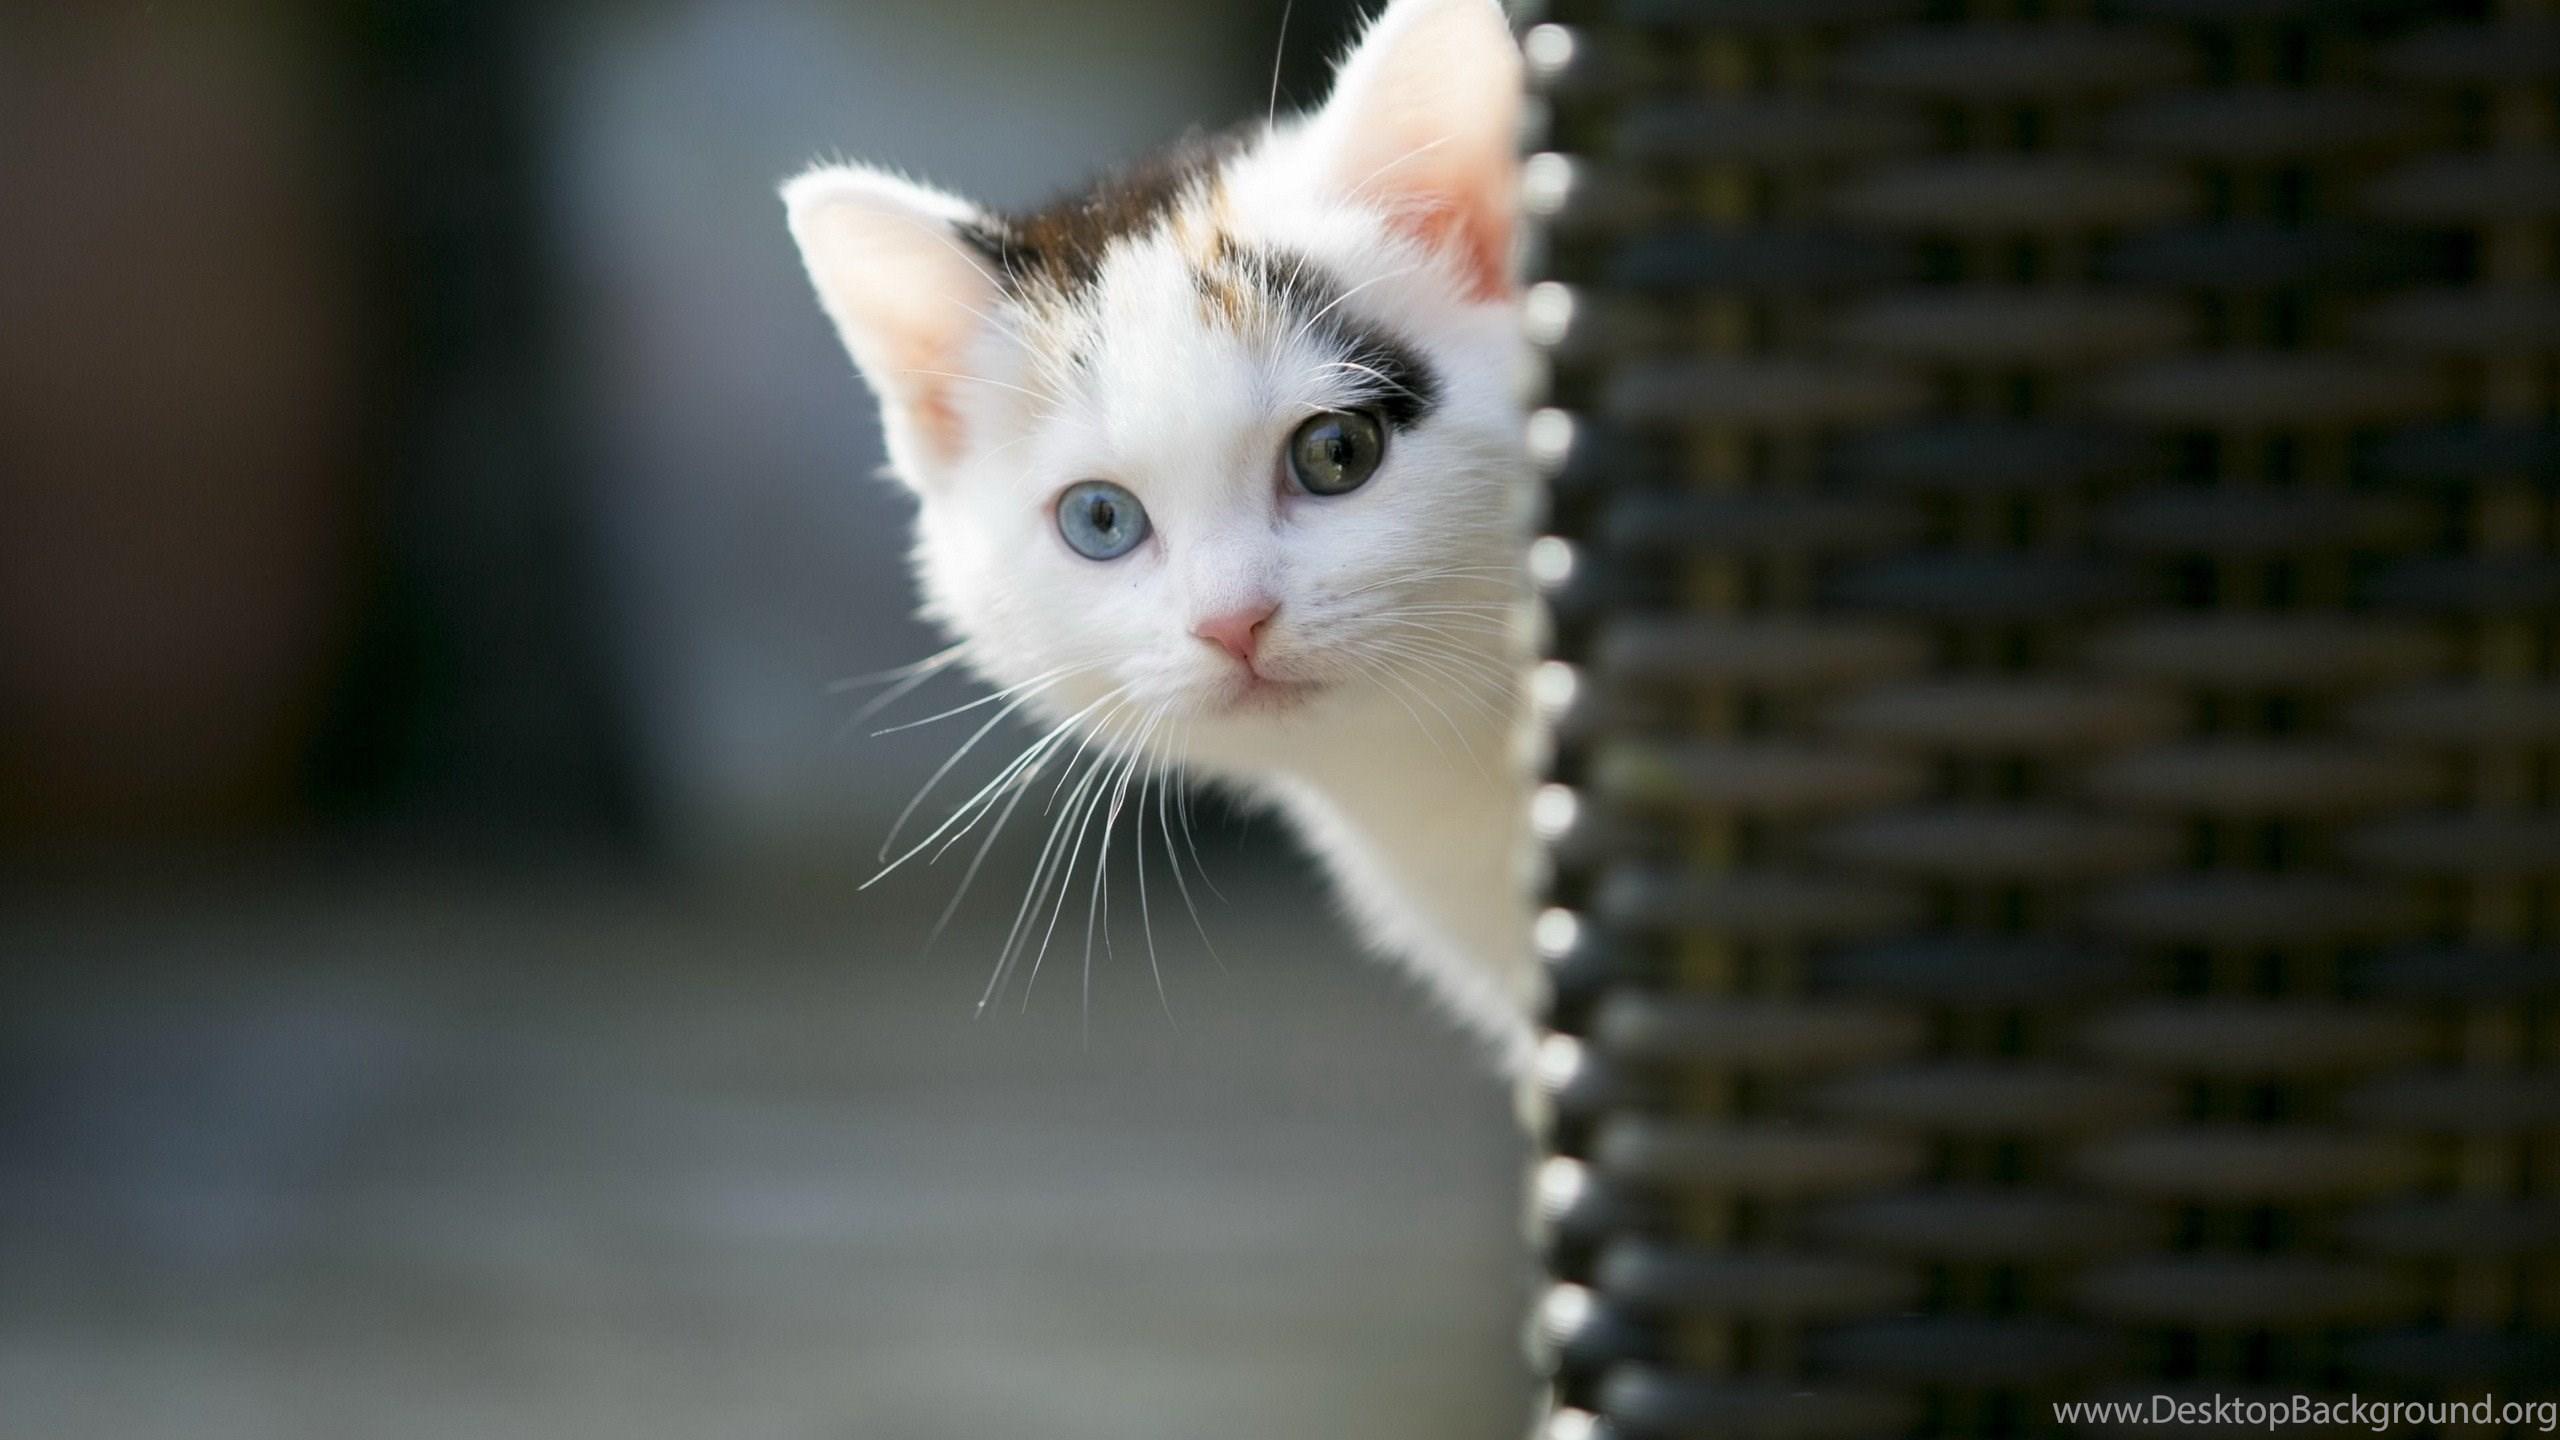 Sweet cat kitty animals cats kitten cute cats wallpapers - Cute kitten backgrounds for desktop ...